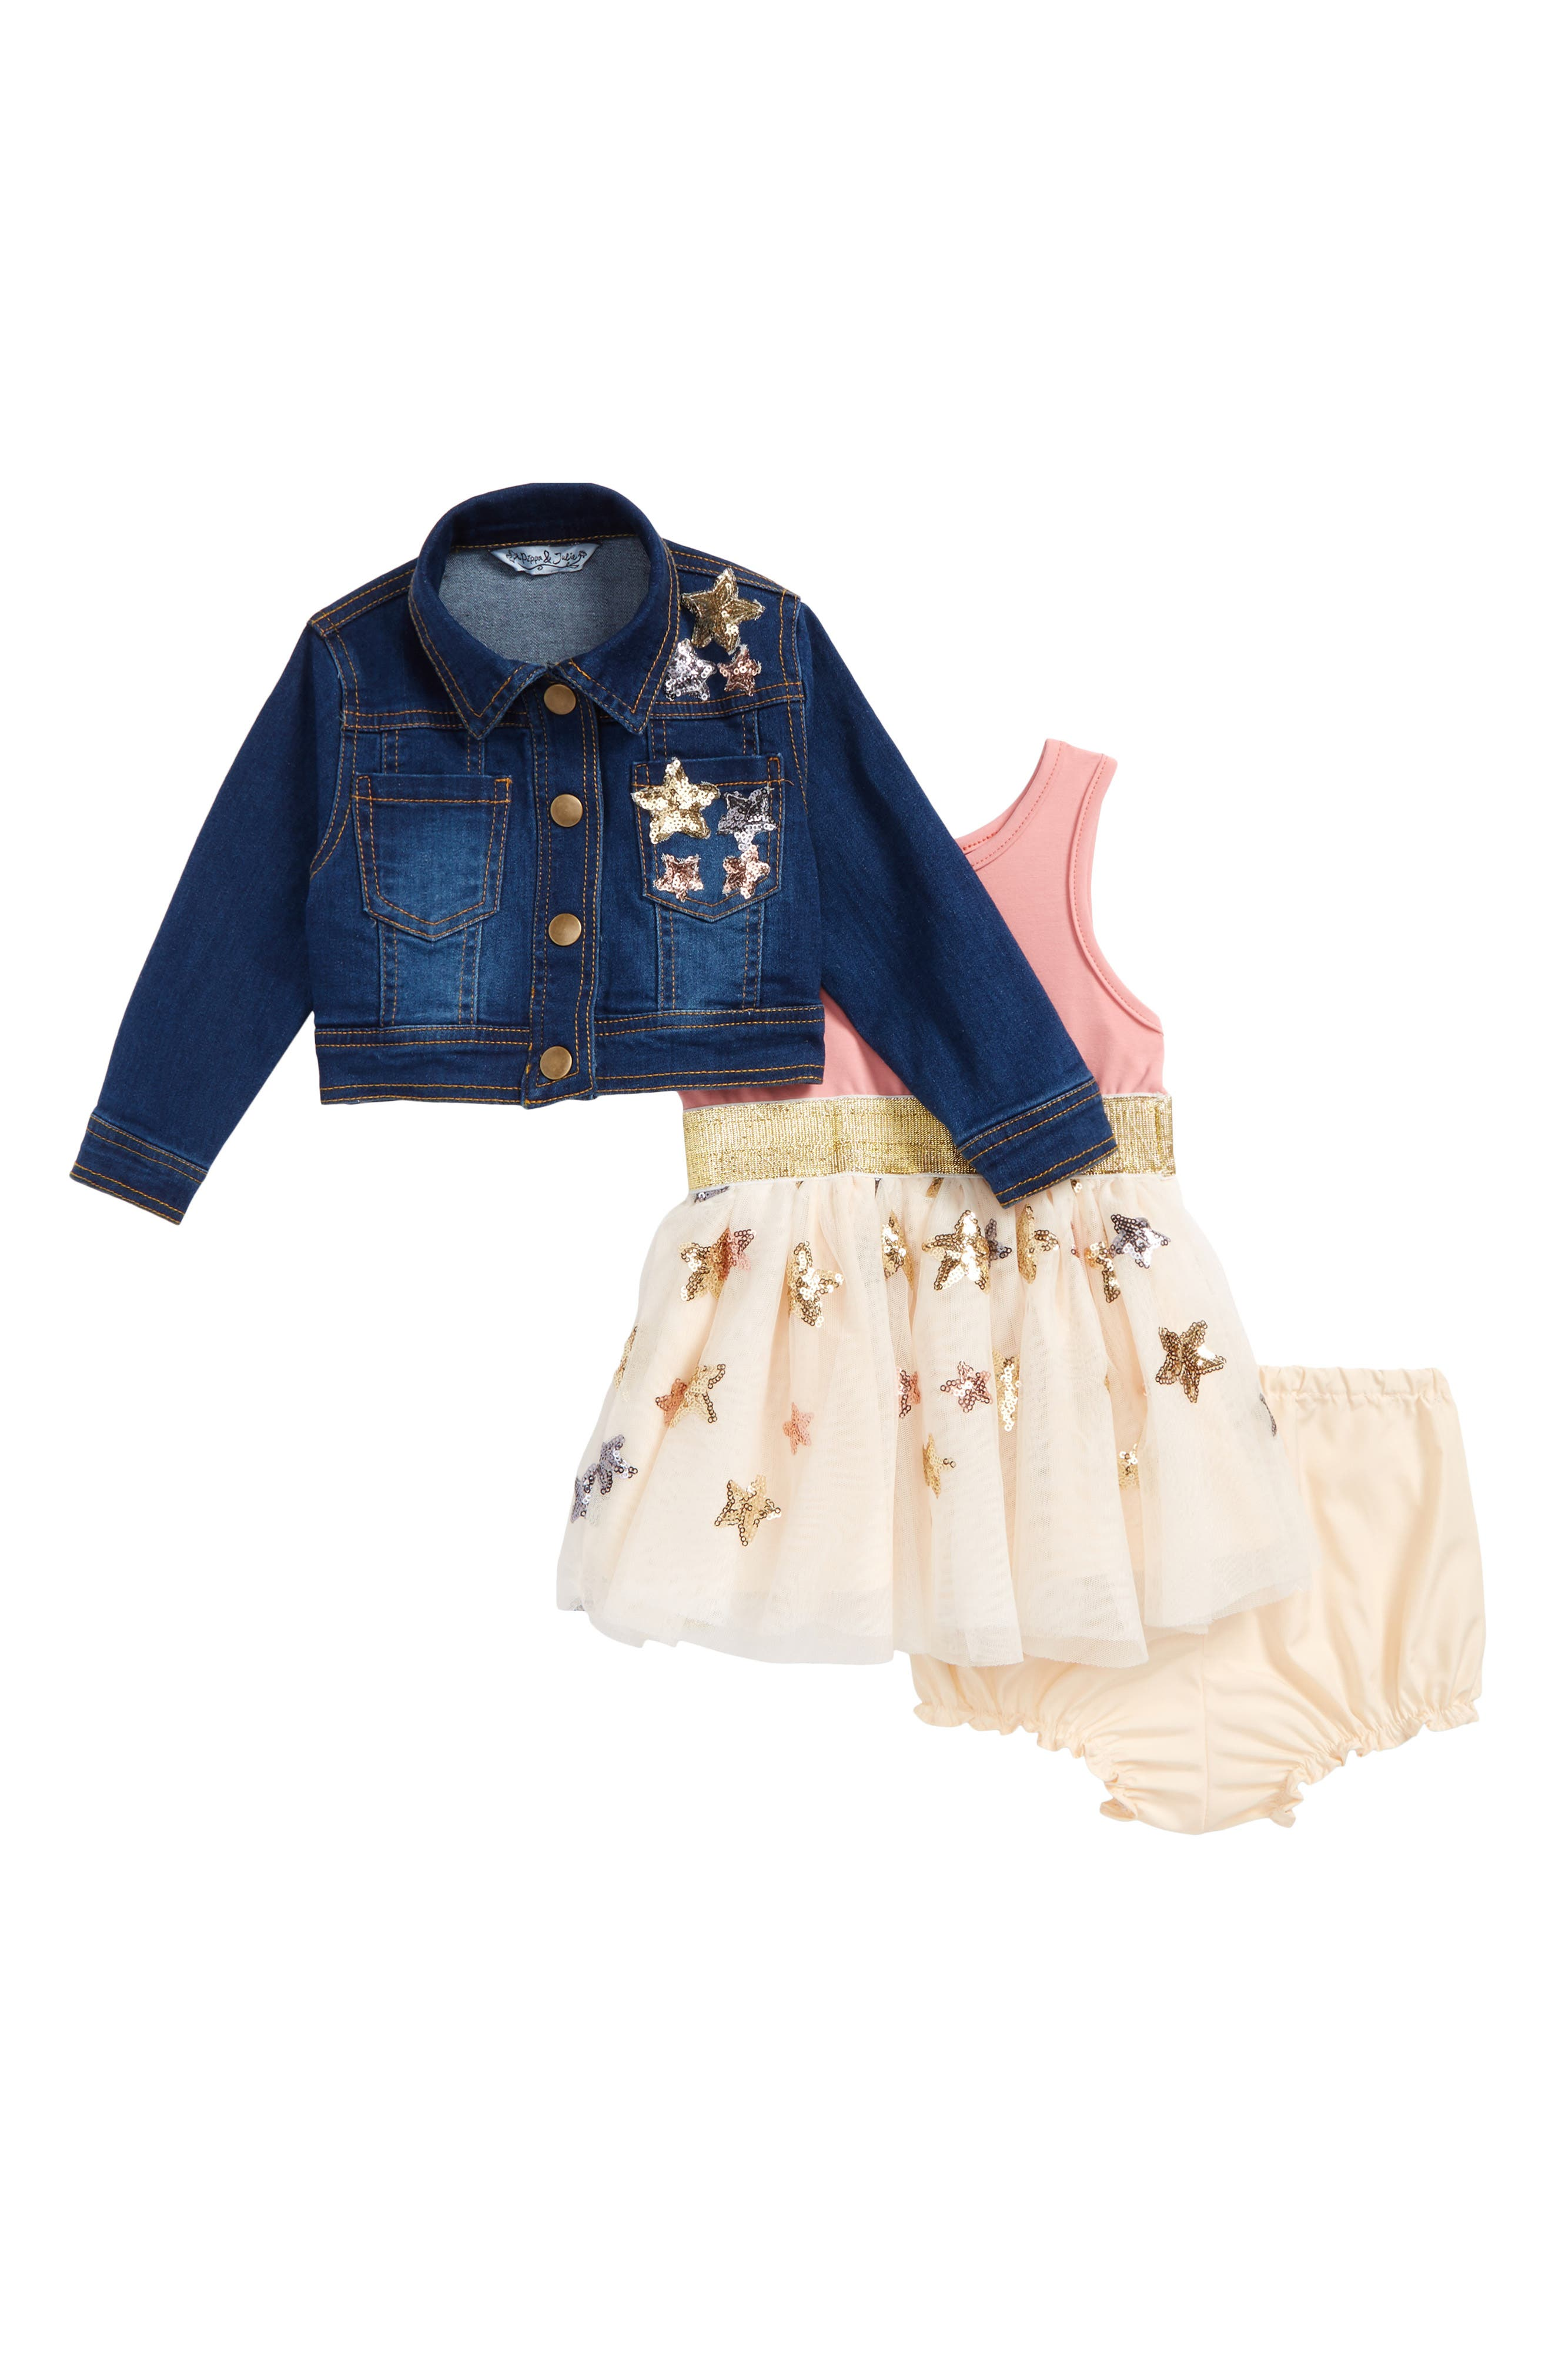 Sequin Star Tank Dress & Denim Jacket Set,                             Main thumbnail 1, color,                             433